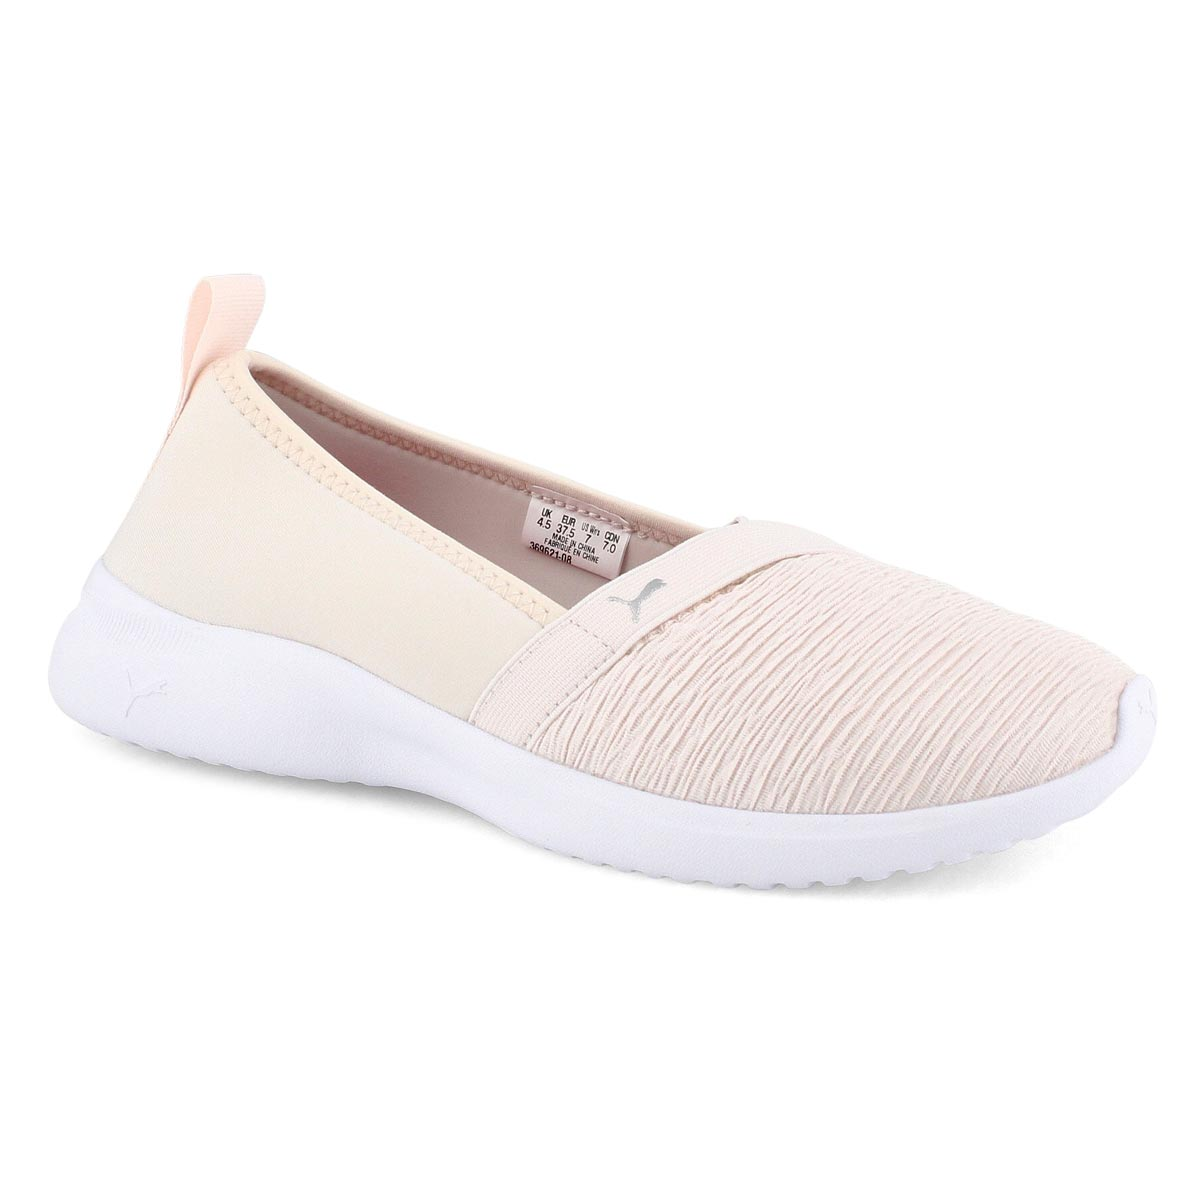 Women's Adelina shoe - Pink/White